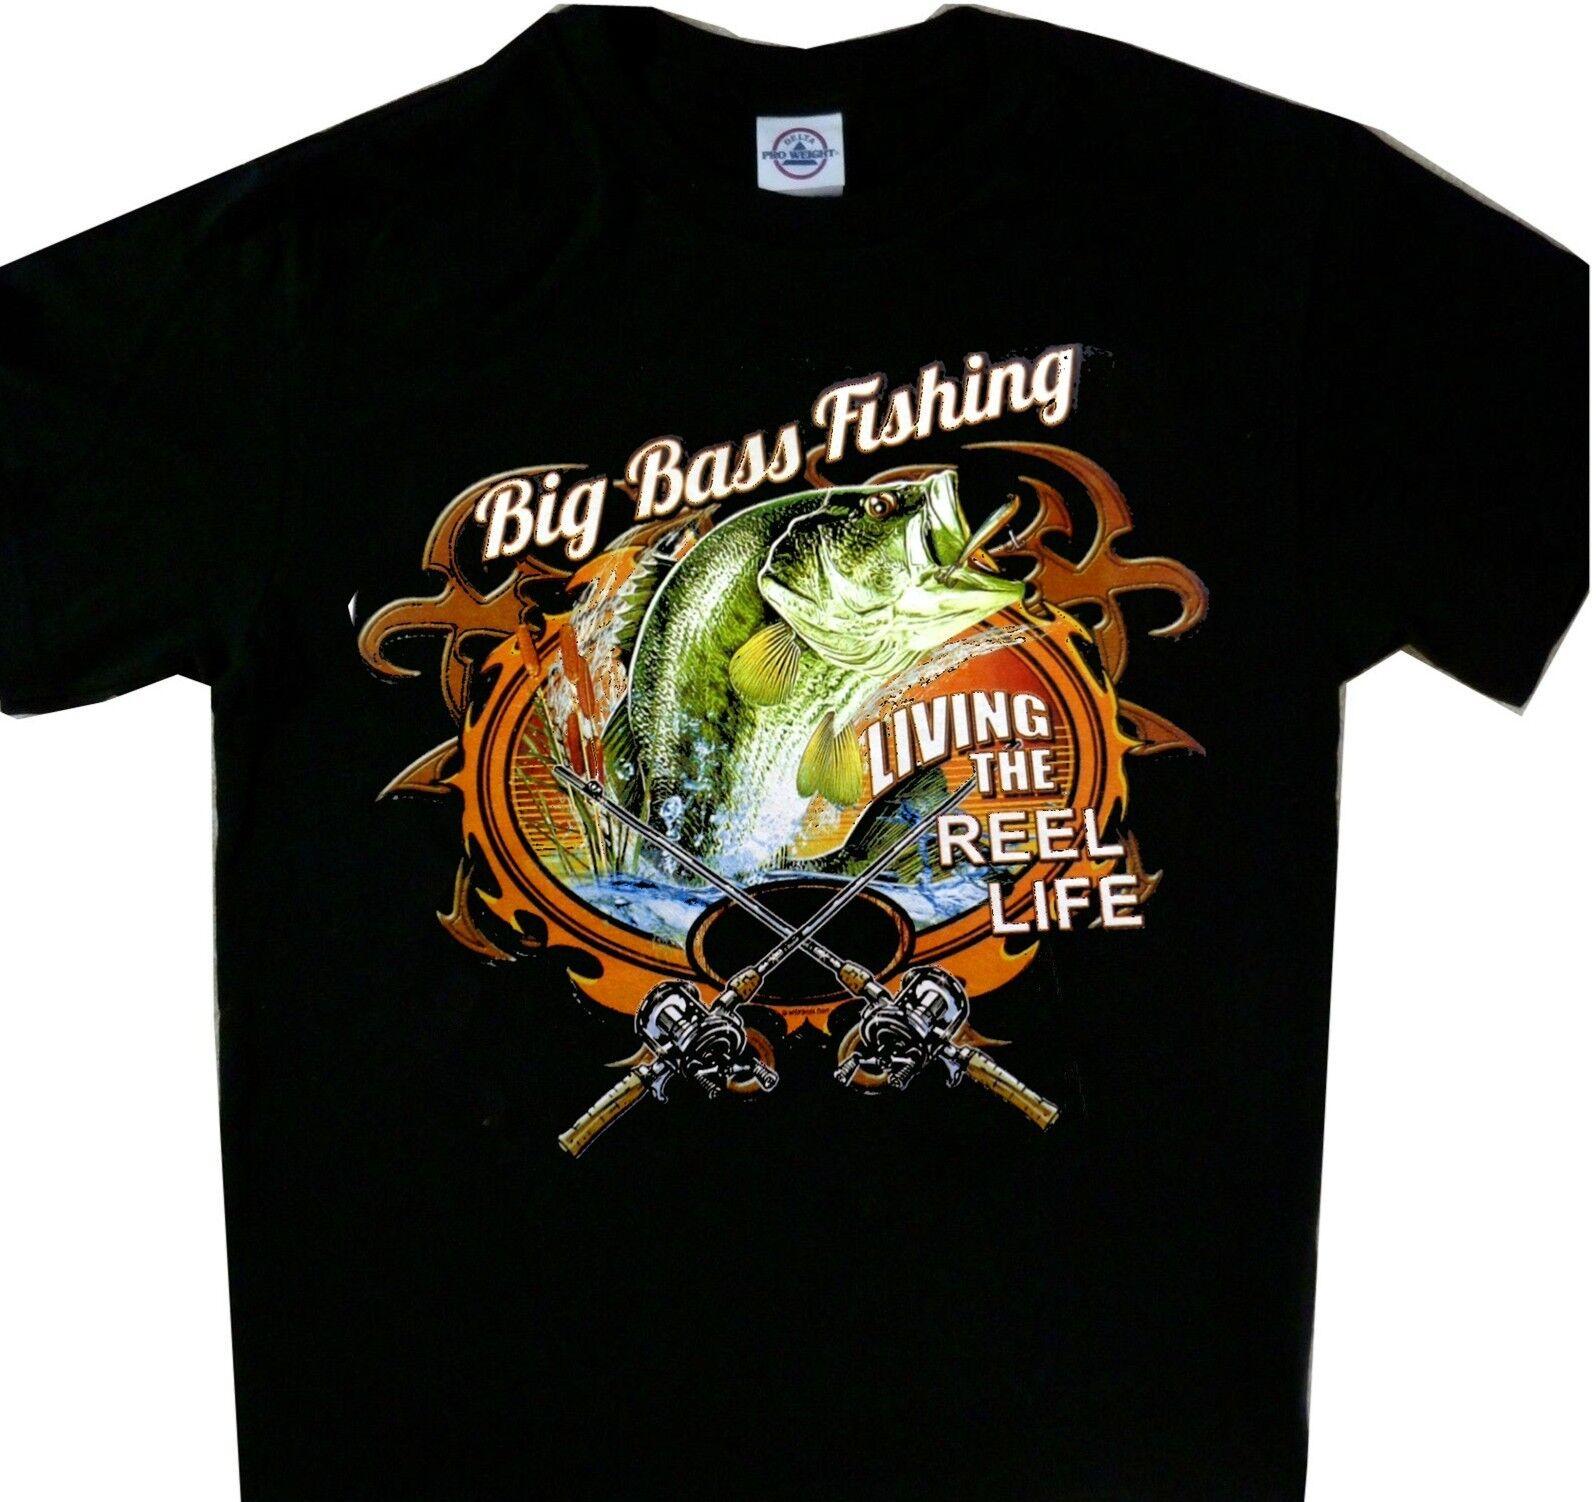 2335573224 Big Bass Fishing living the reel life Tee Black Fishing T'shirt Funny free  shipping Unisex Casual Tshirt top